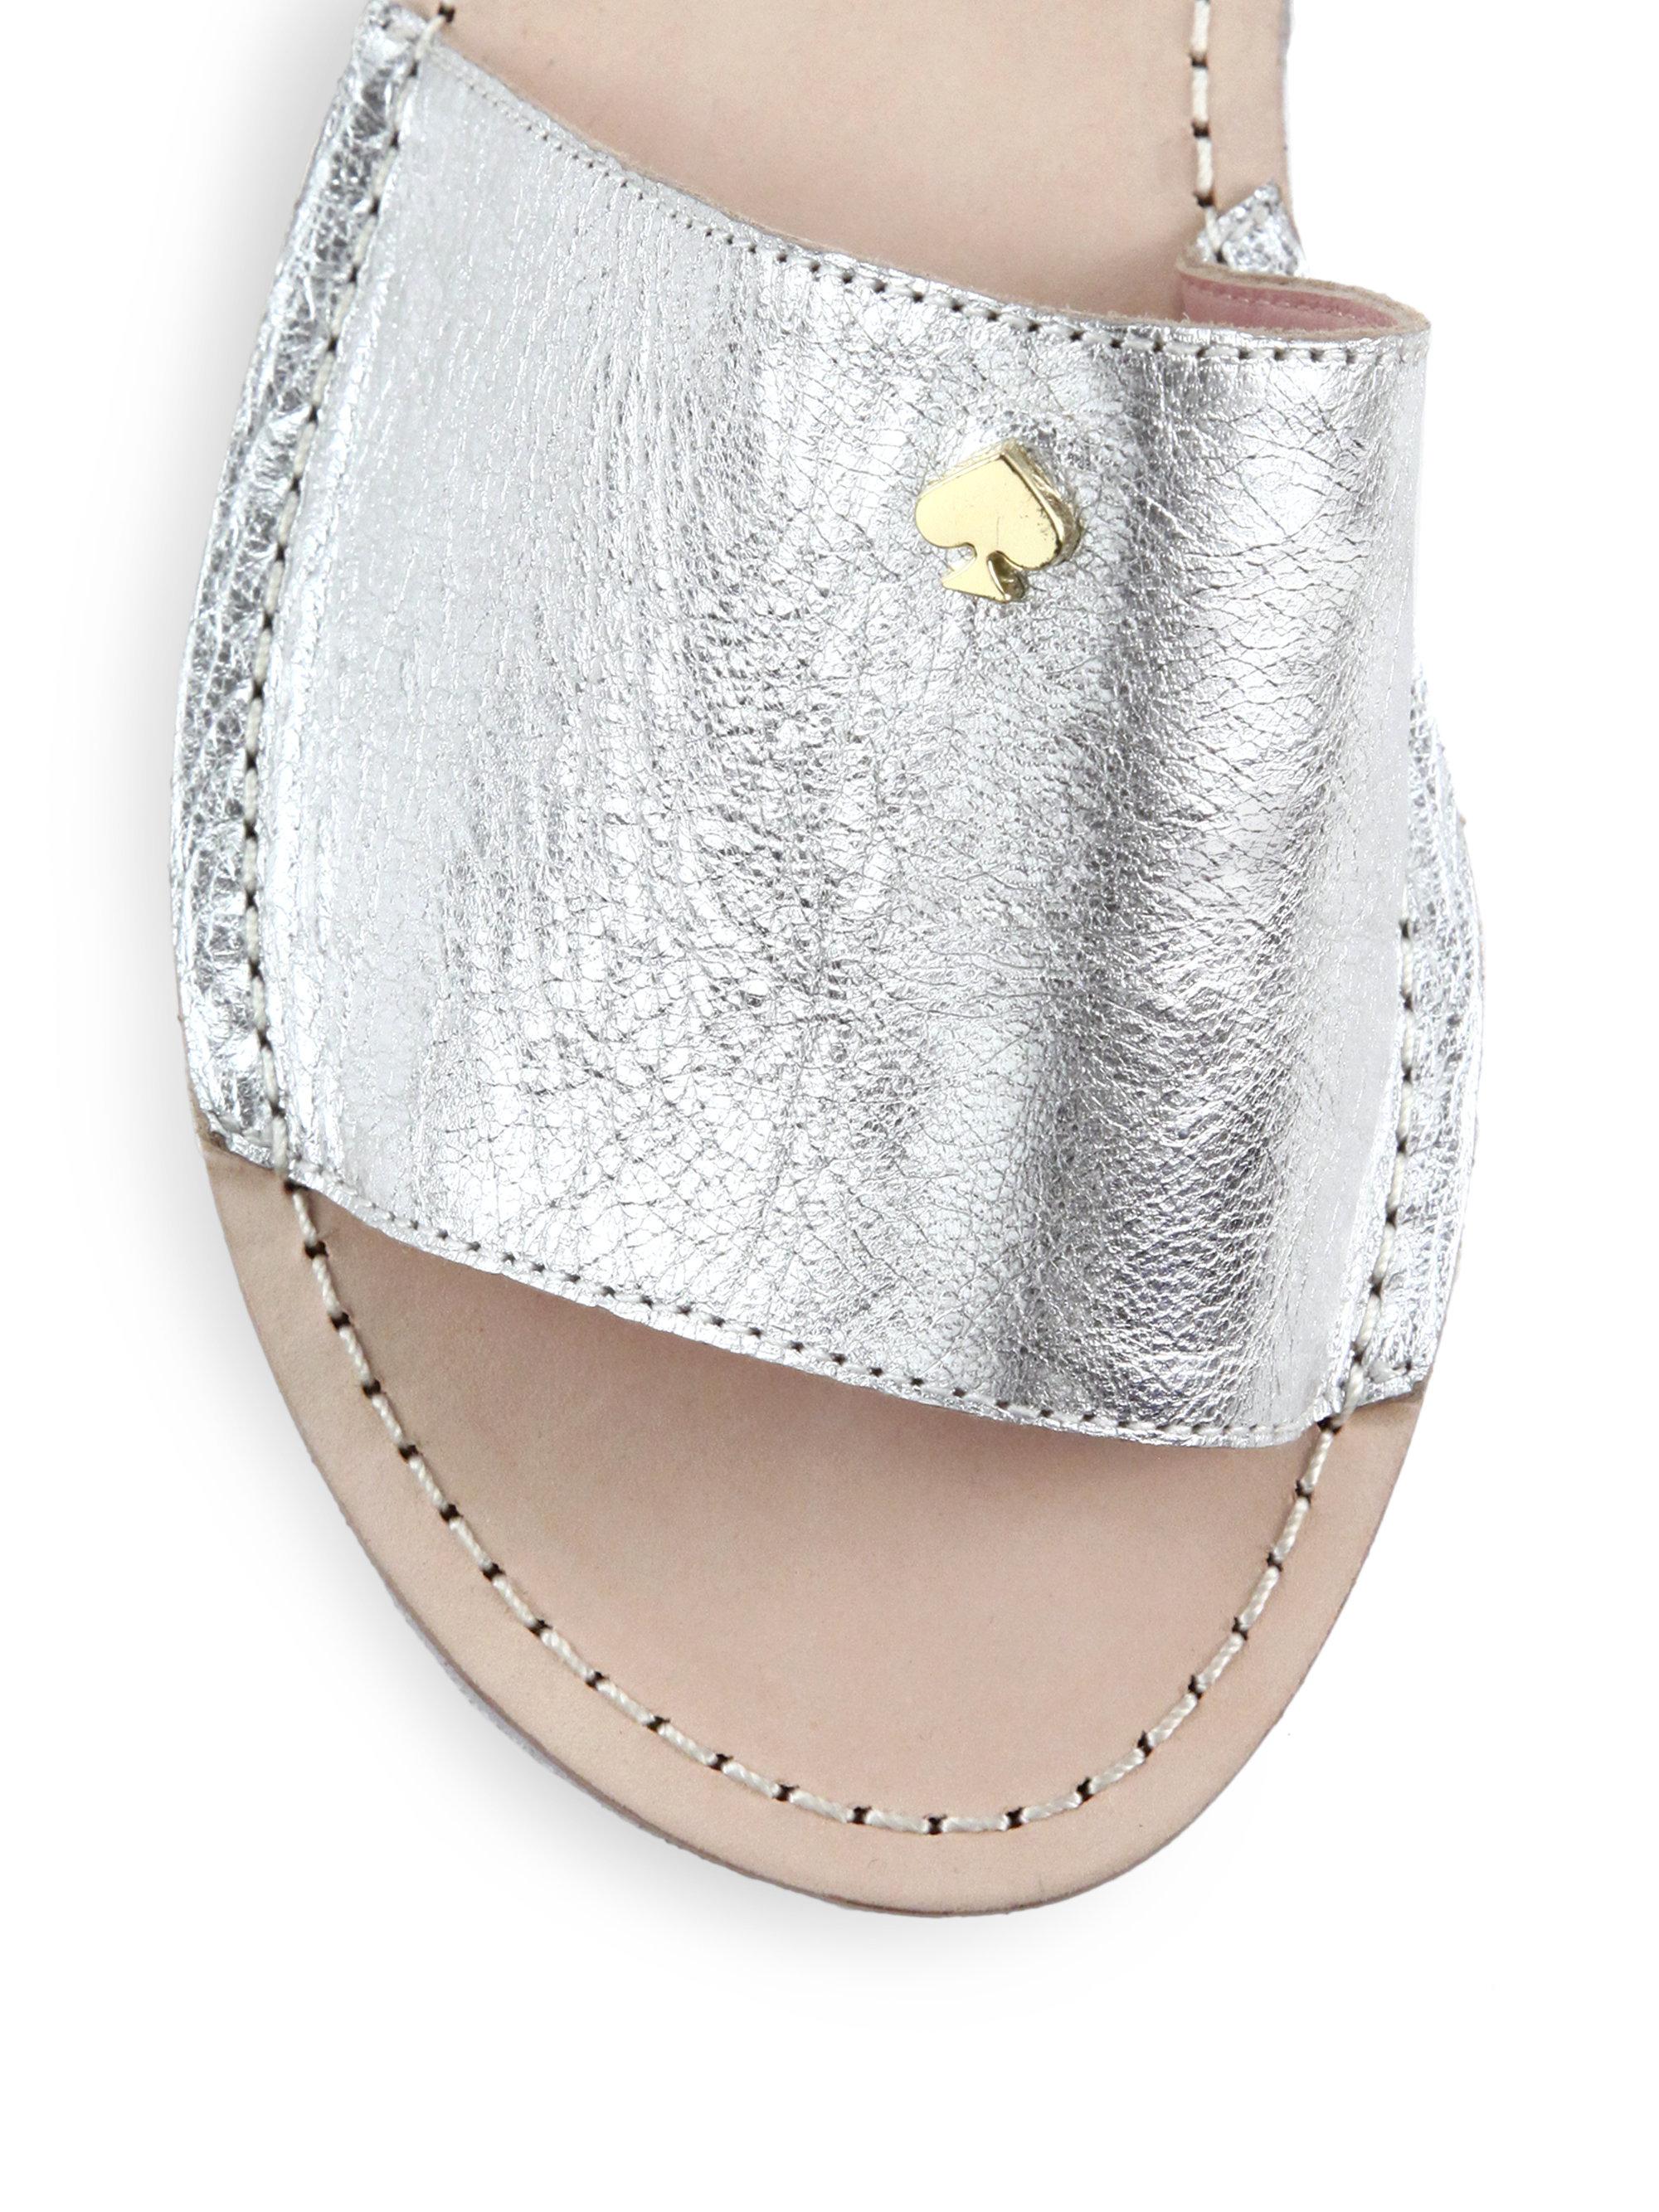 Kate Spade New York Imperiale Metallic Leather Slide